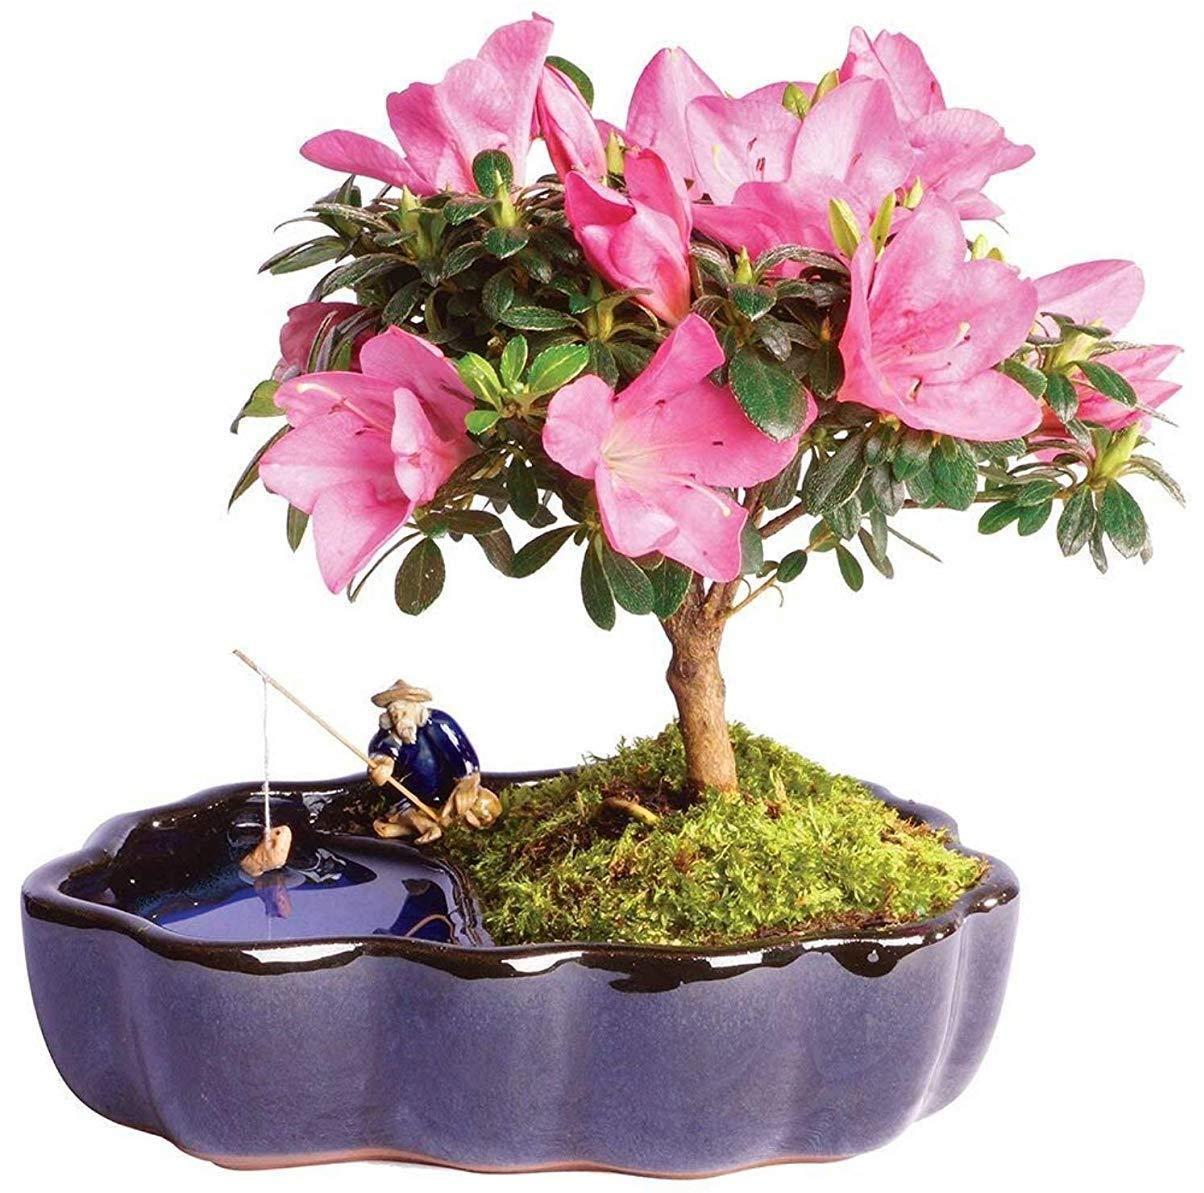 "Brussel's Bonsai Live Satsuki Azalea Outdoor Bonsai Tree in Zen Reflections Pot-4 Years Old 8"" to 10"" Tall,"